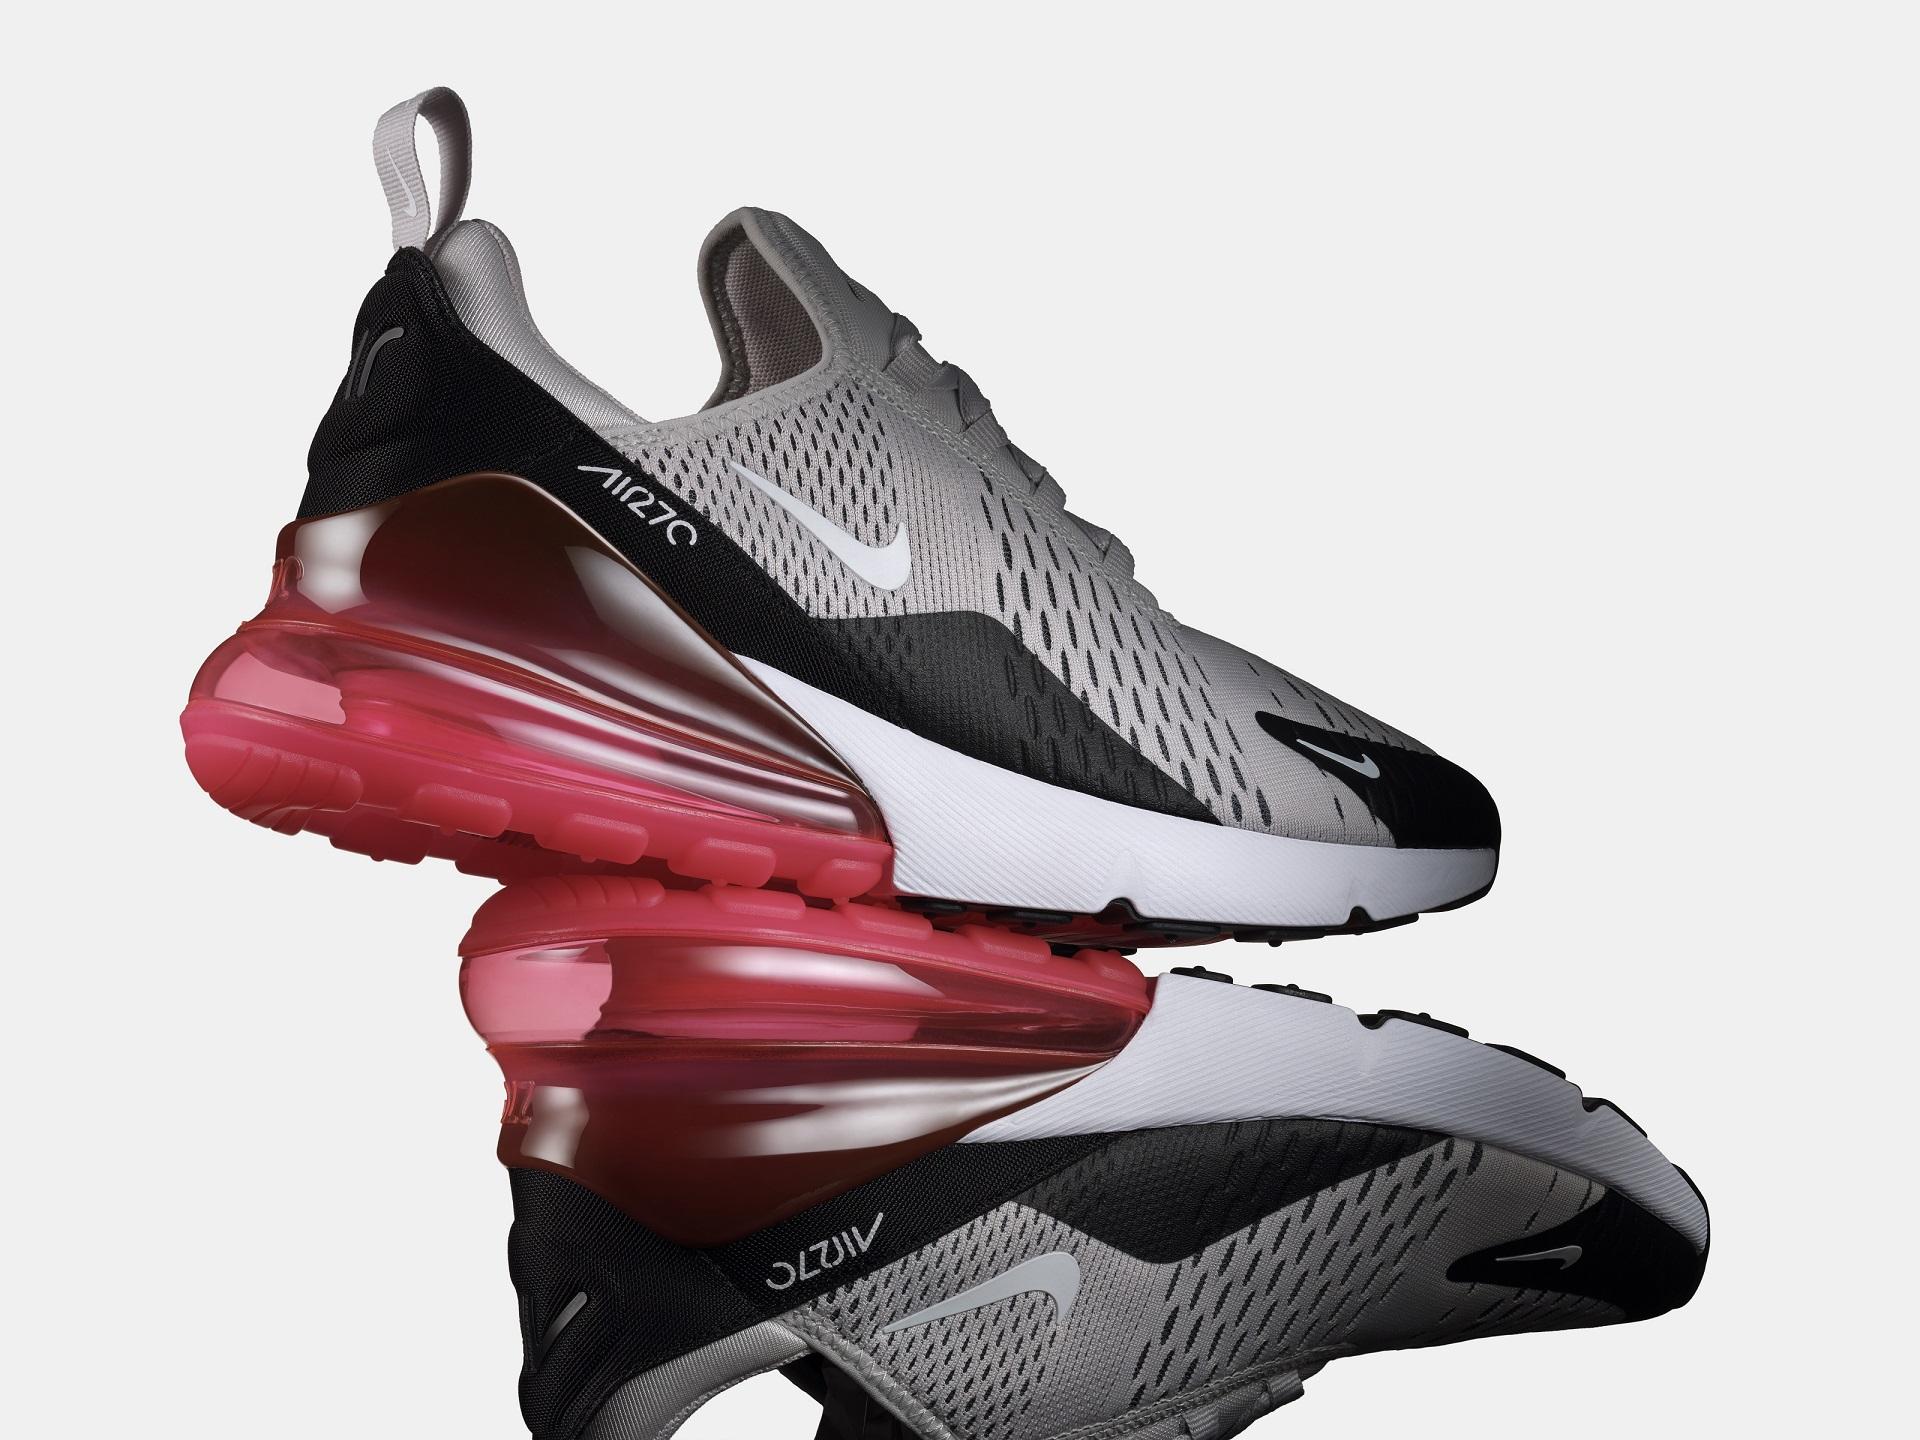 Nike Air Max 270 Hol, milyet, mennyiért? sneakerbox.hu blog